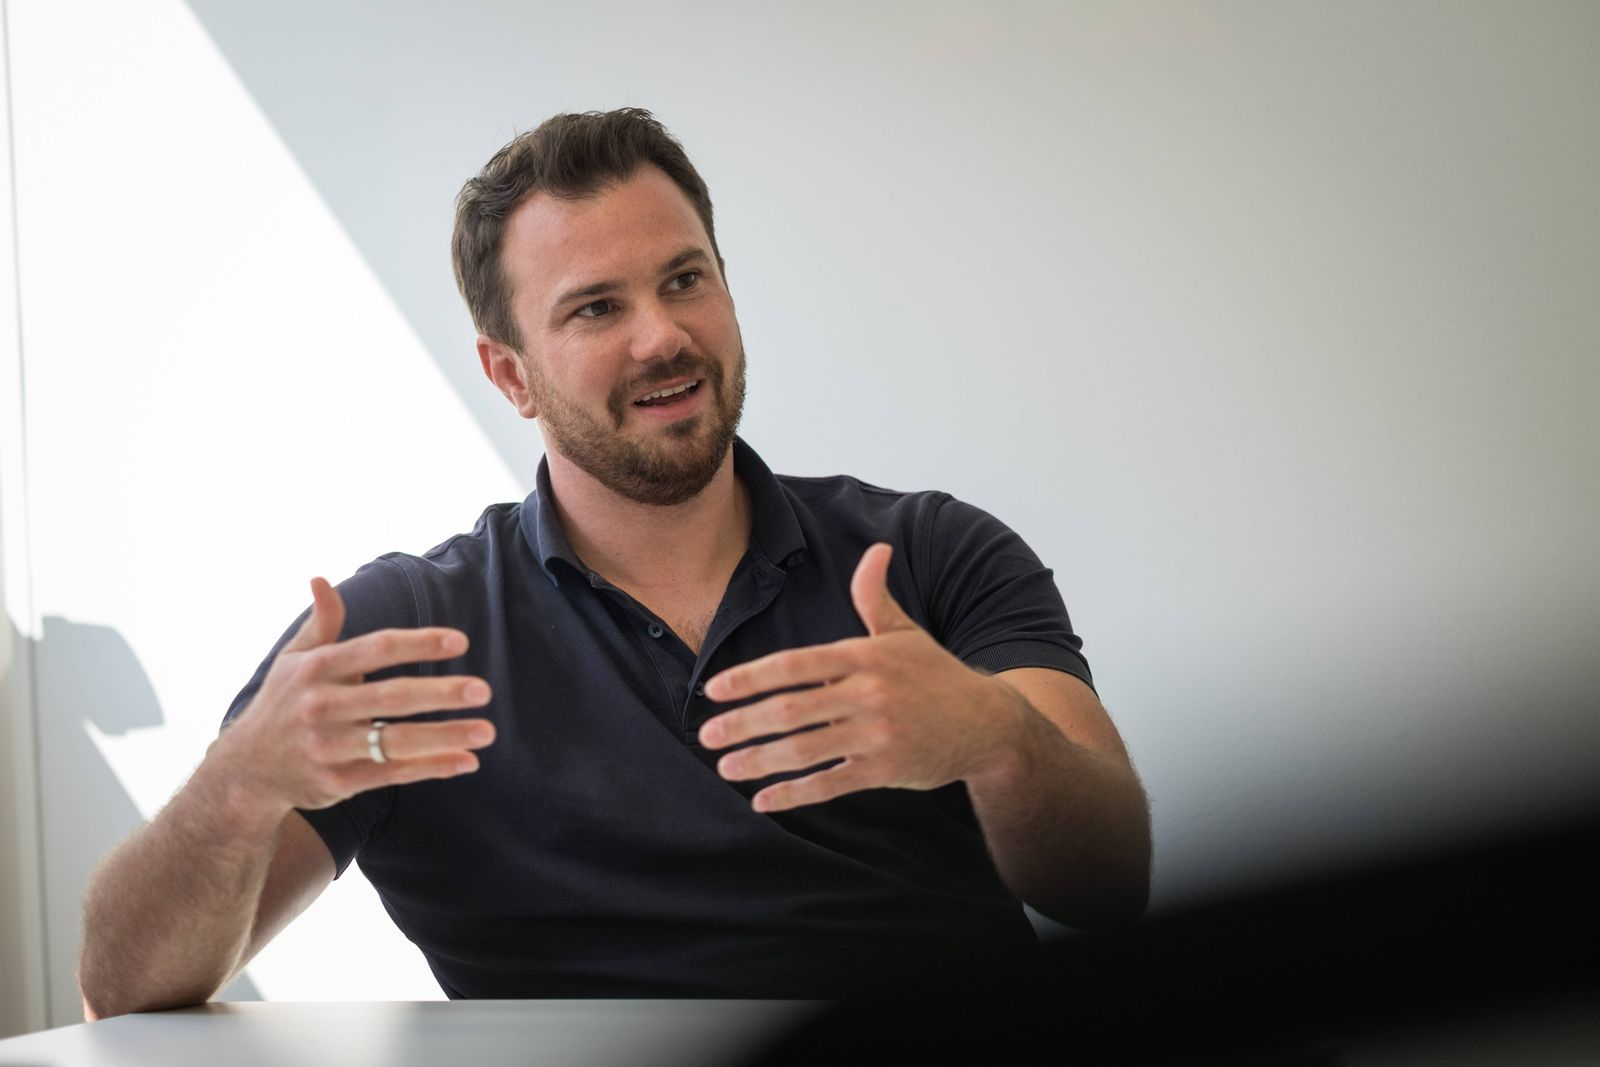 Interview mit dem Stuttgarter Tesla Geschaeftsfuehrer Jochen Rudat Jochen Rudat Tesla